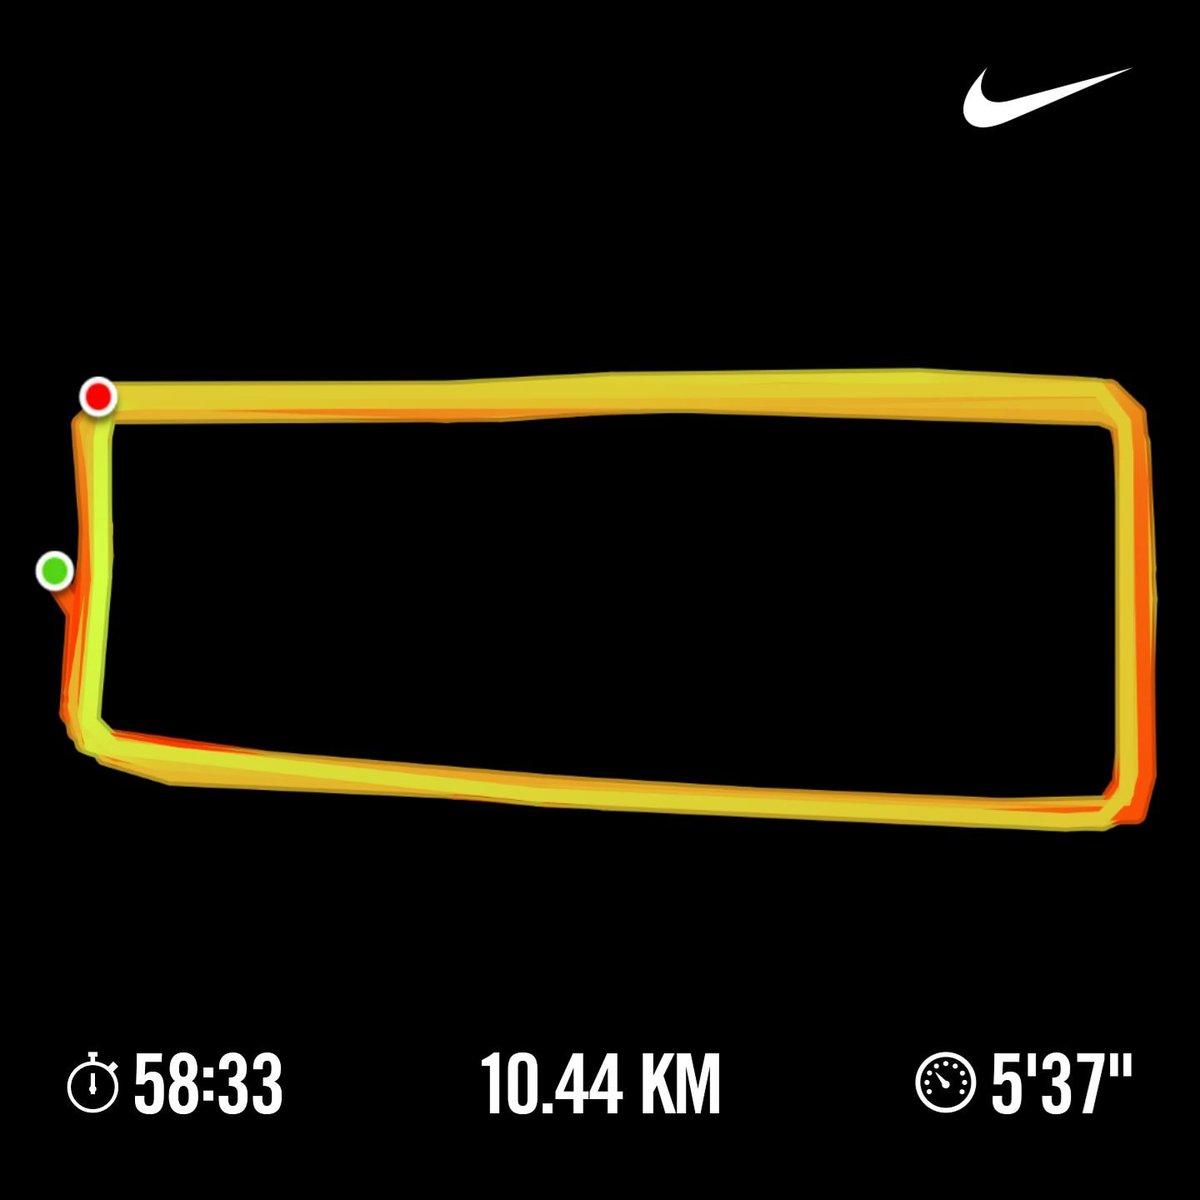 10.44km  Another day another run  CNN shey we will rest after today abi?  #nikeplus #fitfam #runner #strava #GoogleFit #itsAmarathon #ItsALifestyle #IamAccountable #yourturn   ✅👌🇳🇬🔥💪🏃♂️✌